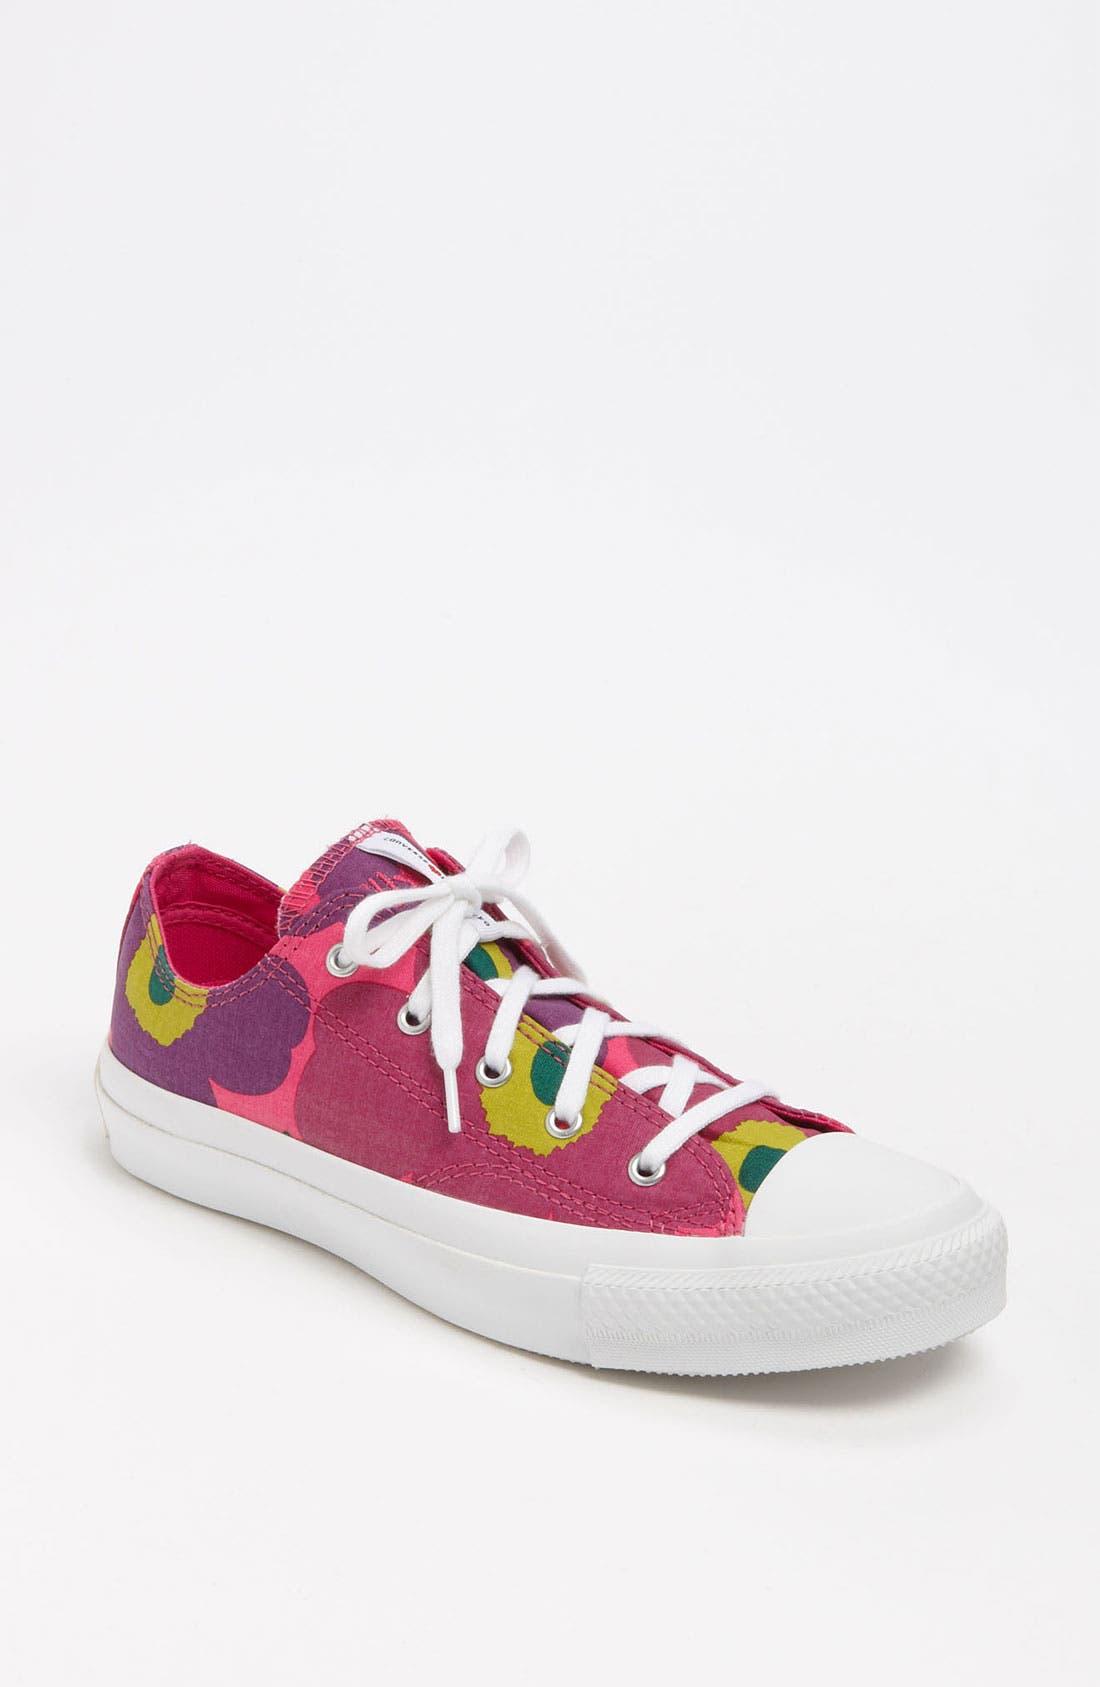 Main Image - Converse Loves Merimekko Chuck Taylor® Low Sneaker (Women)